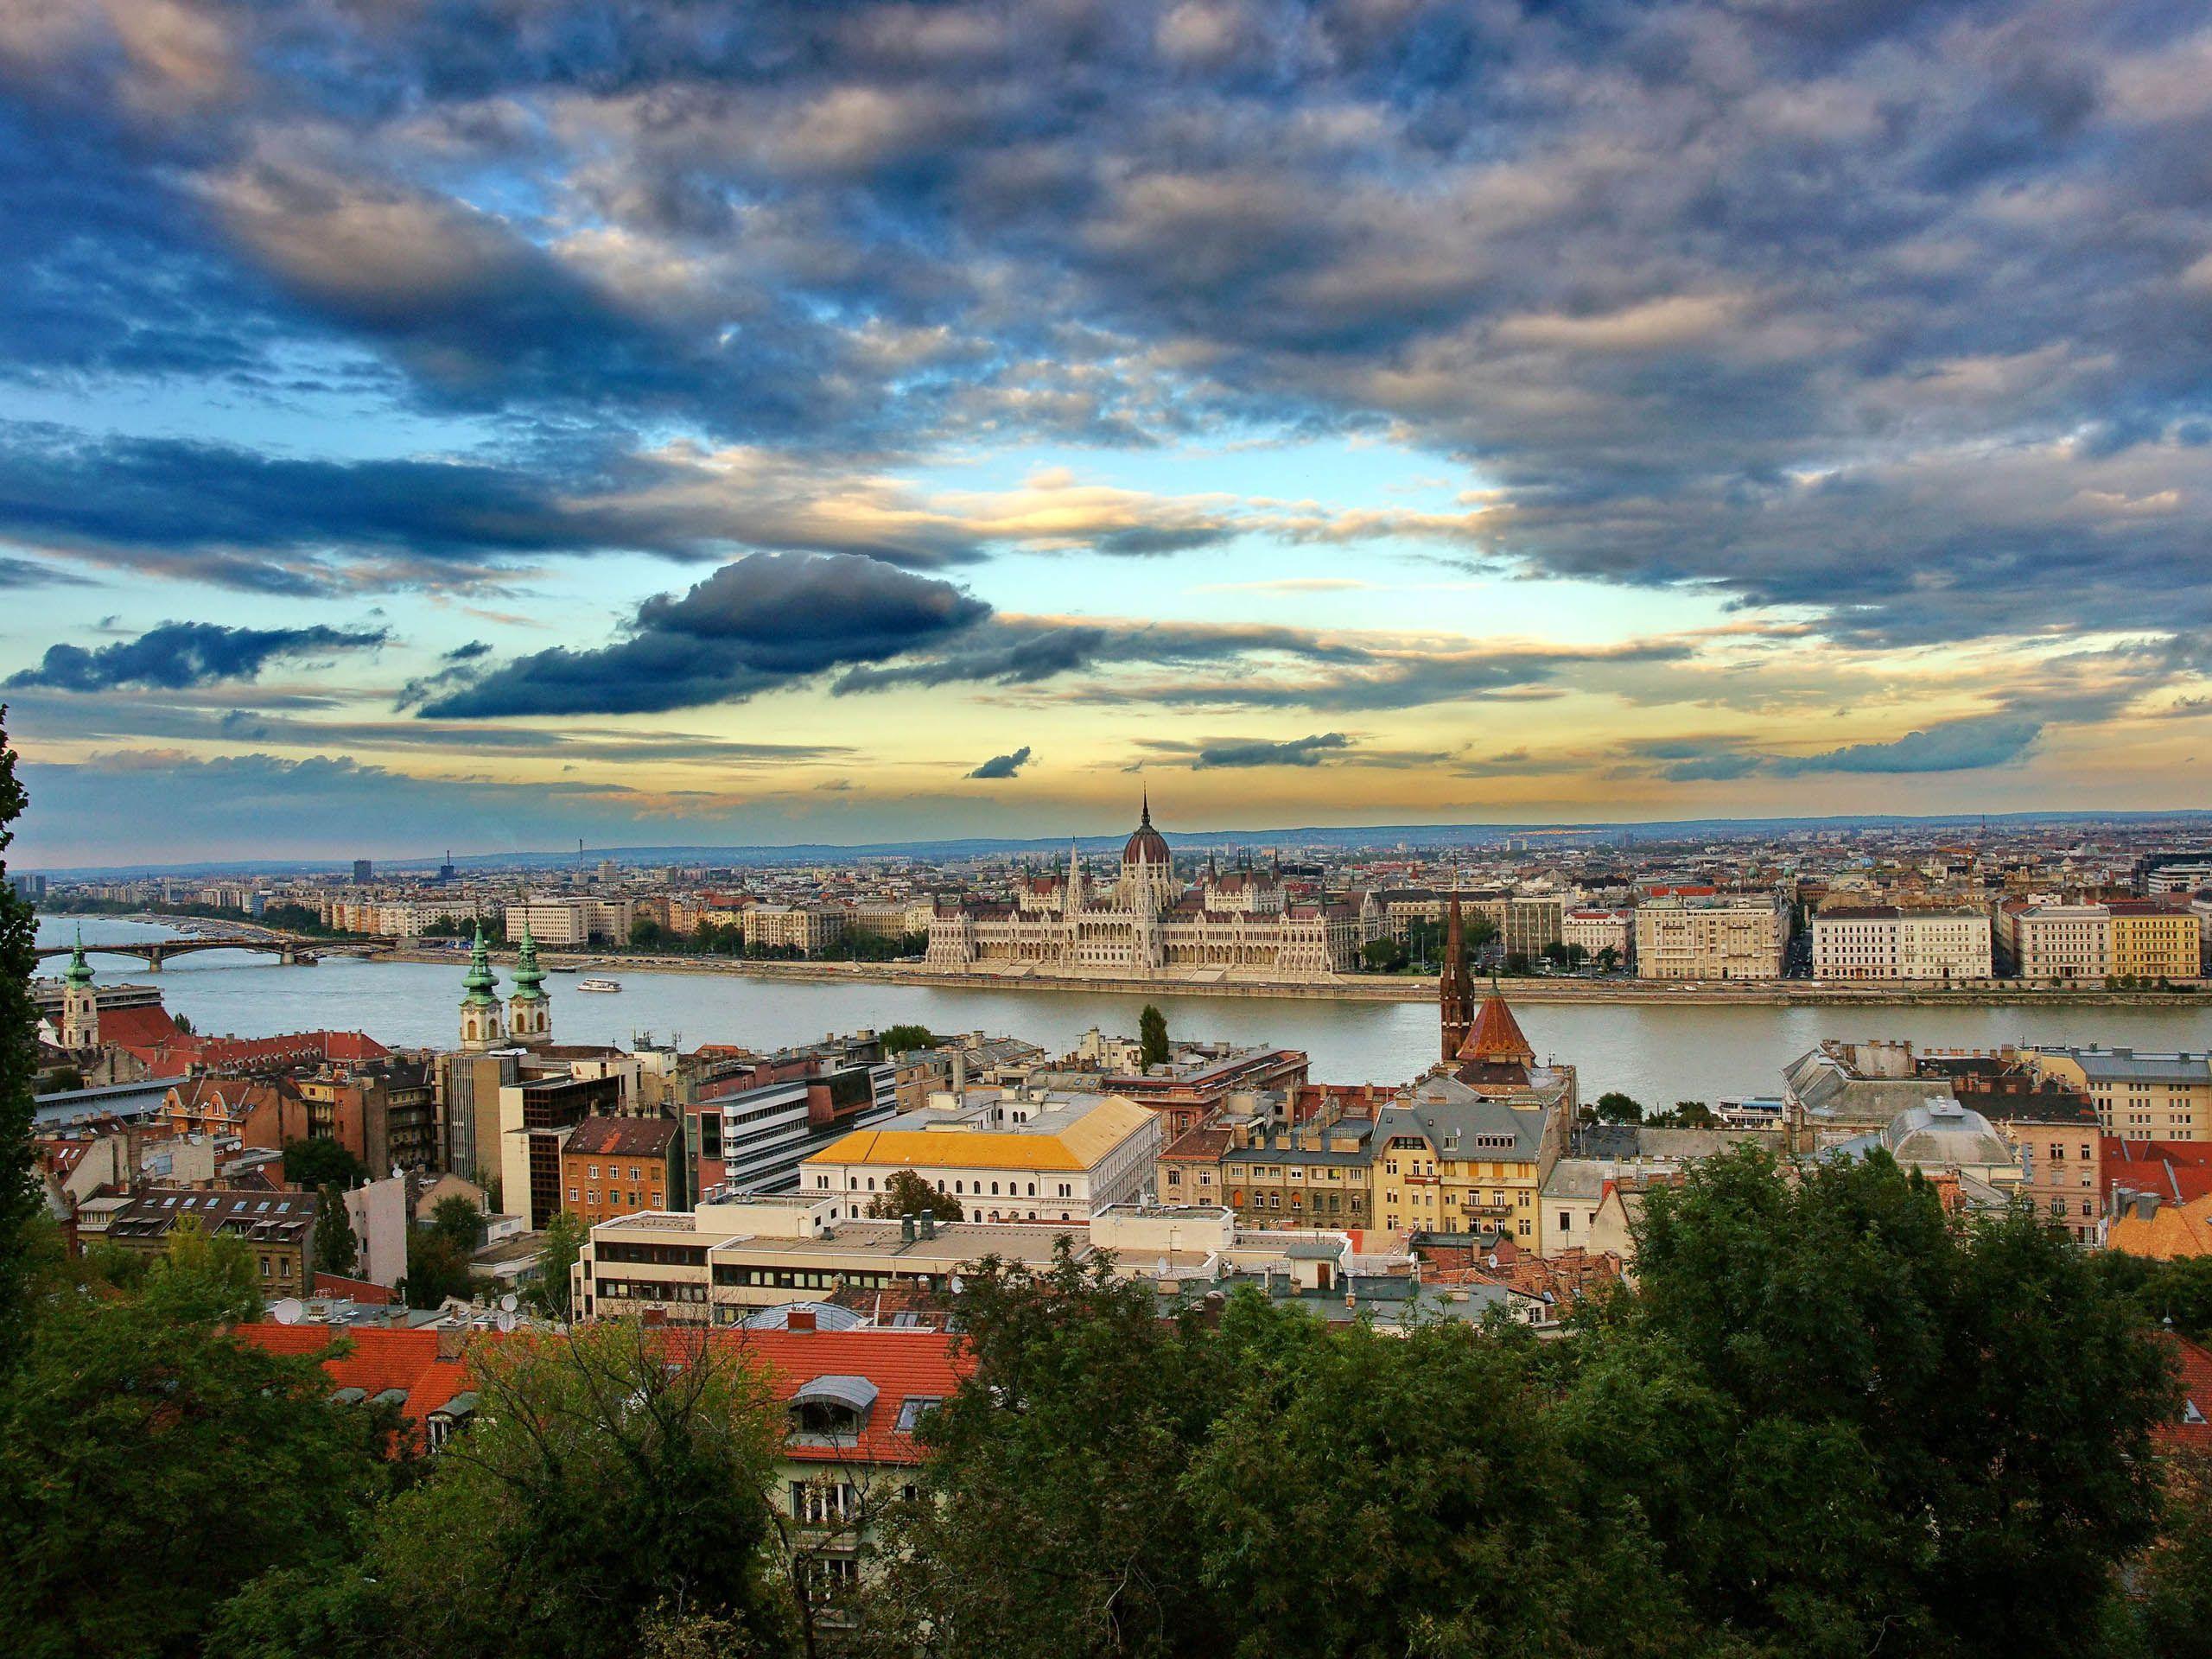 landscape-budapest-budapest-hungary.jpg